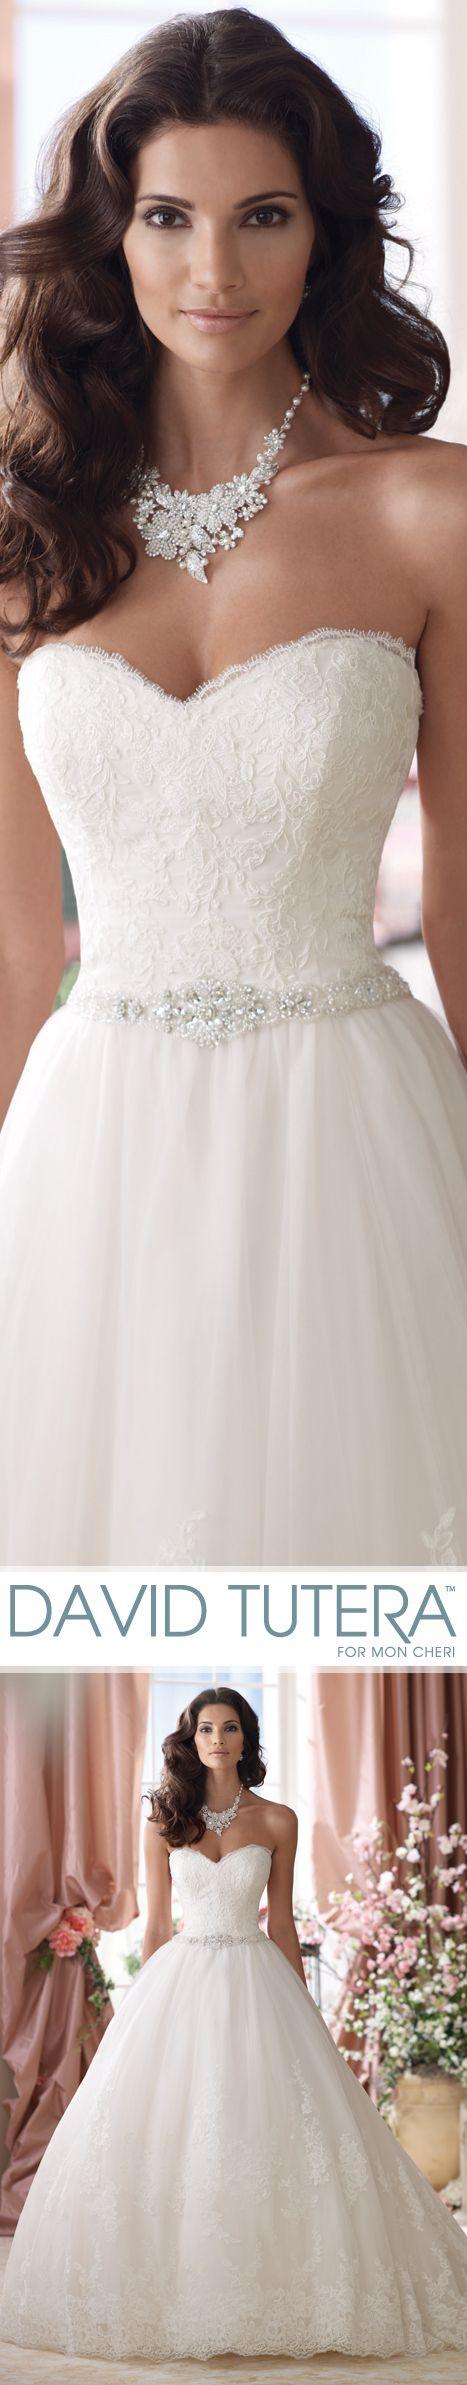 David tutera wedding dresses 2017 for mon cheri bridal for How much are mon cheri wedding dresses